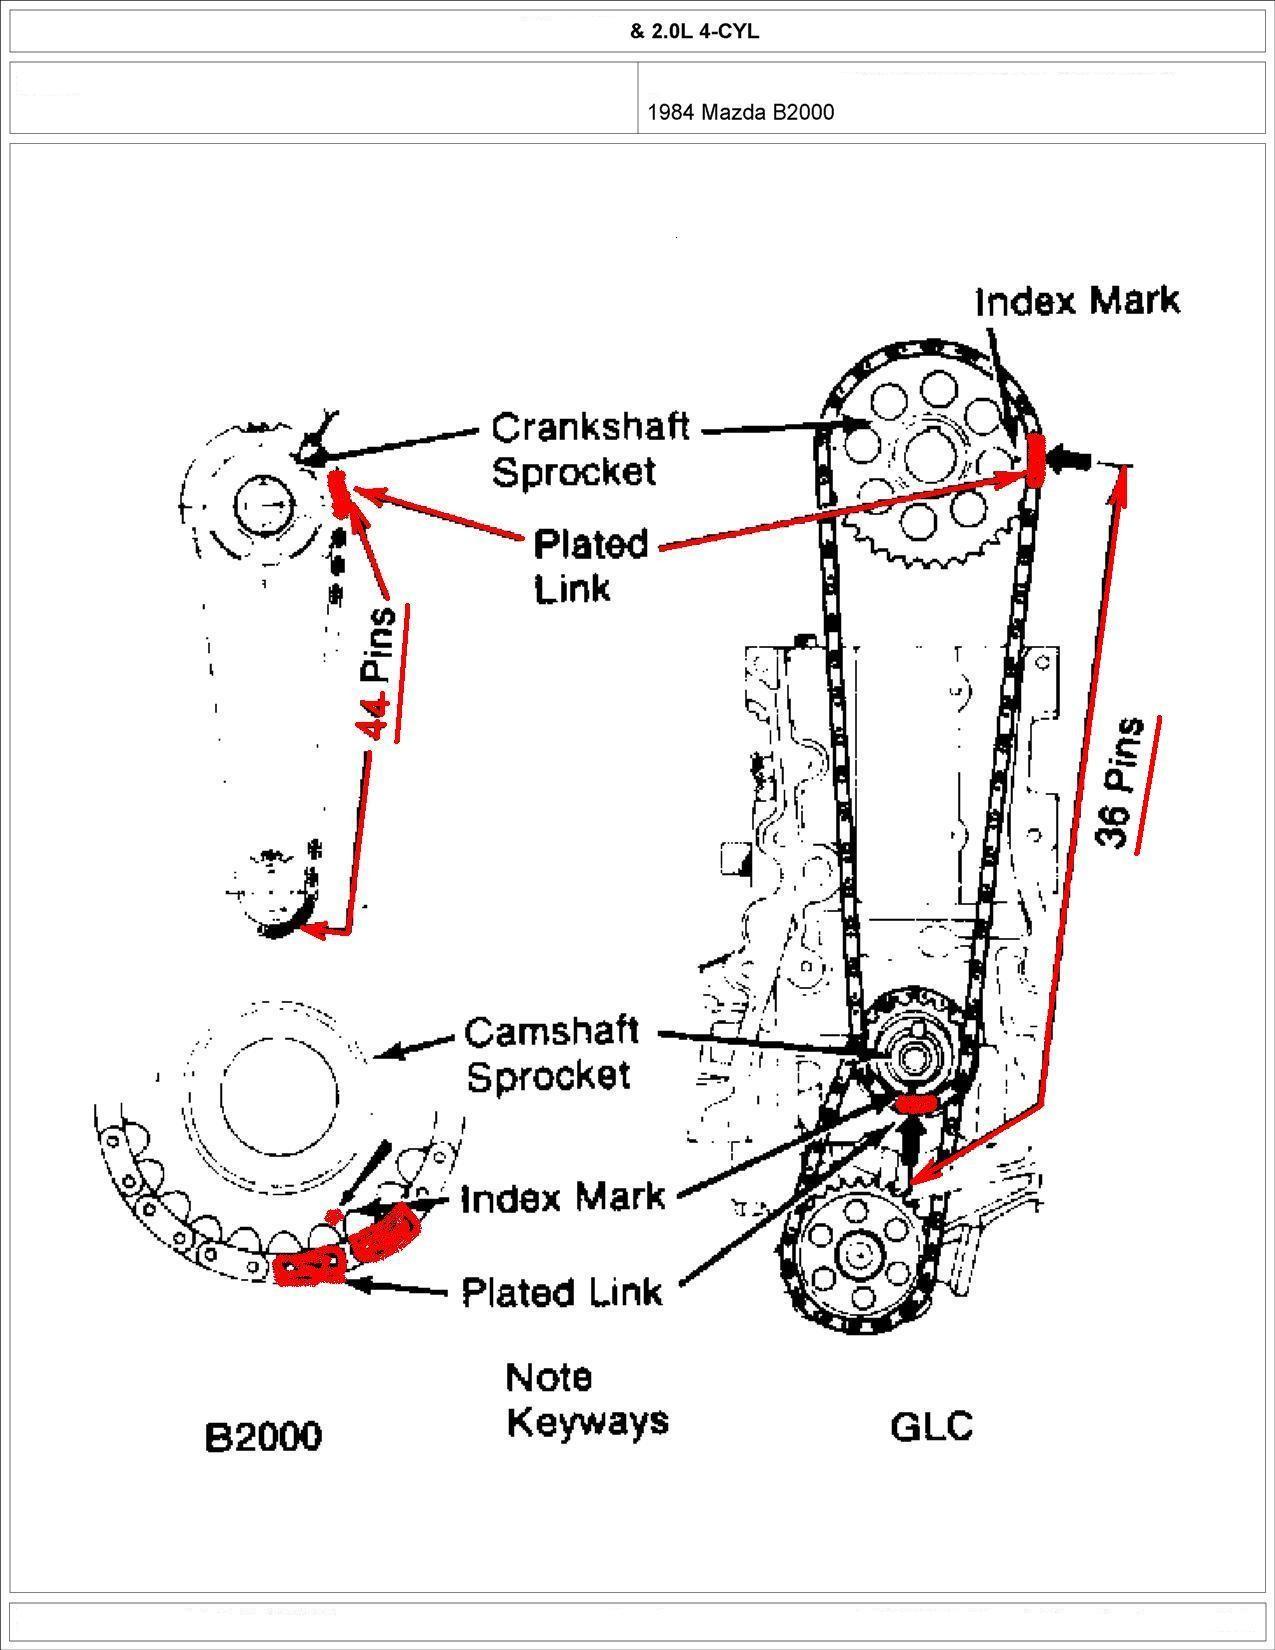 4 stroke engine timing diagram adriansmodelaeroengines va